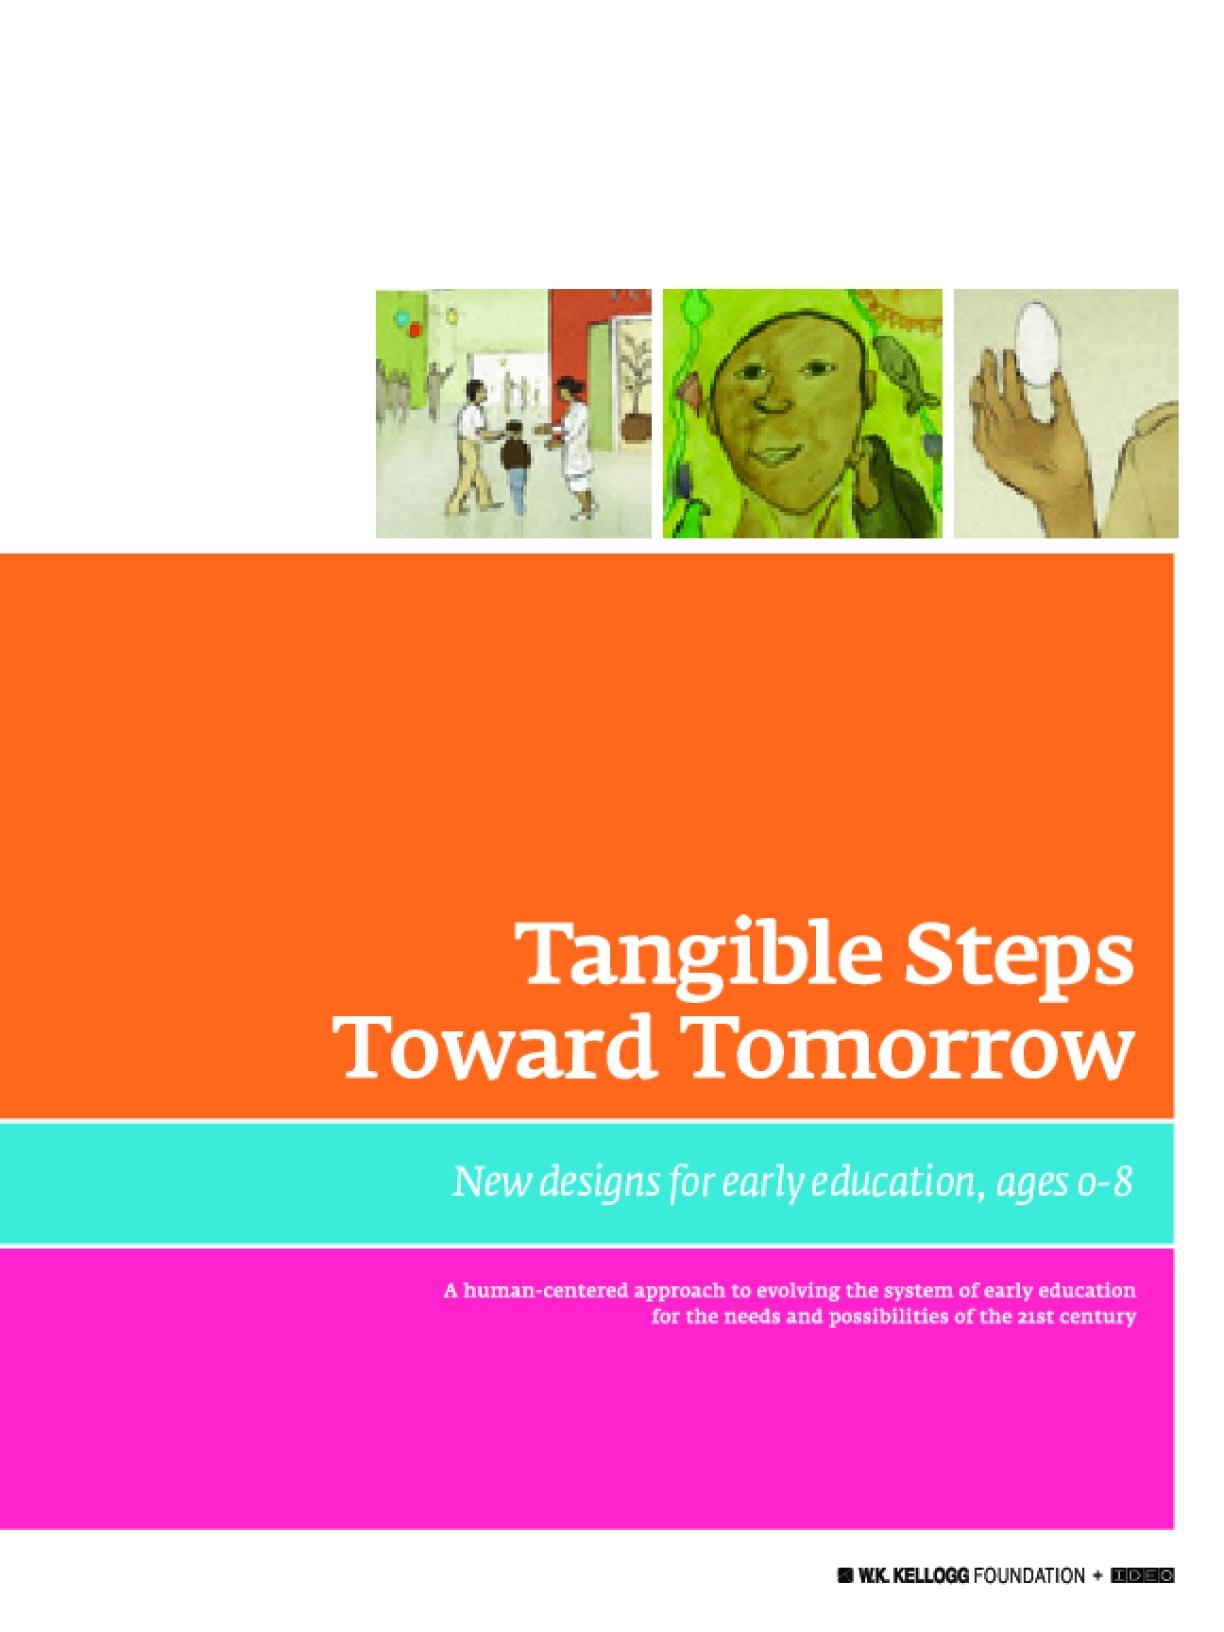 Tangible Steps Toward Tomorrow